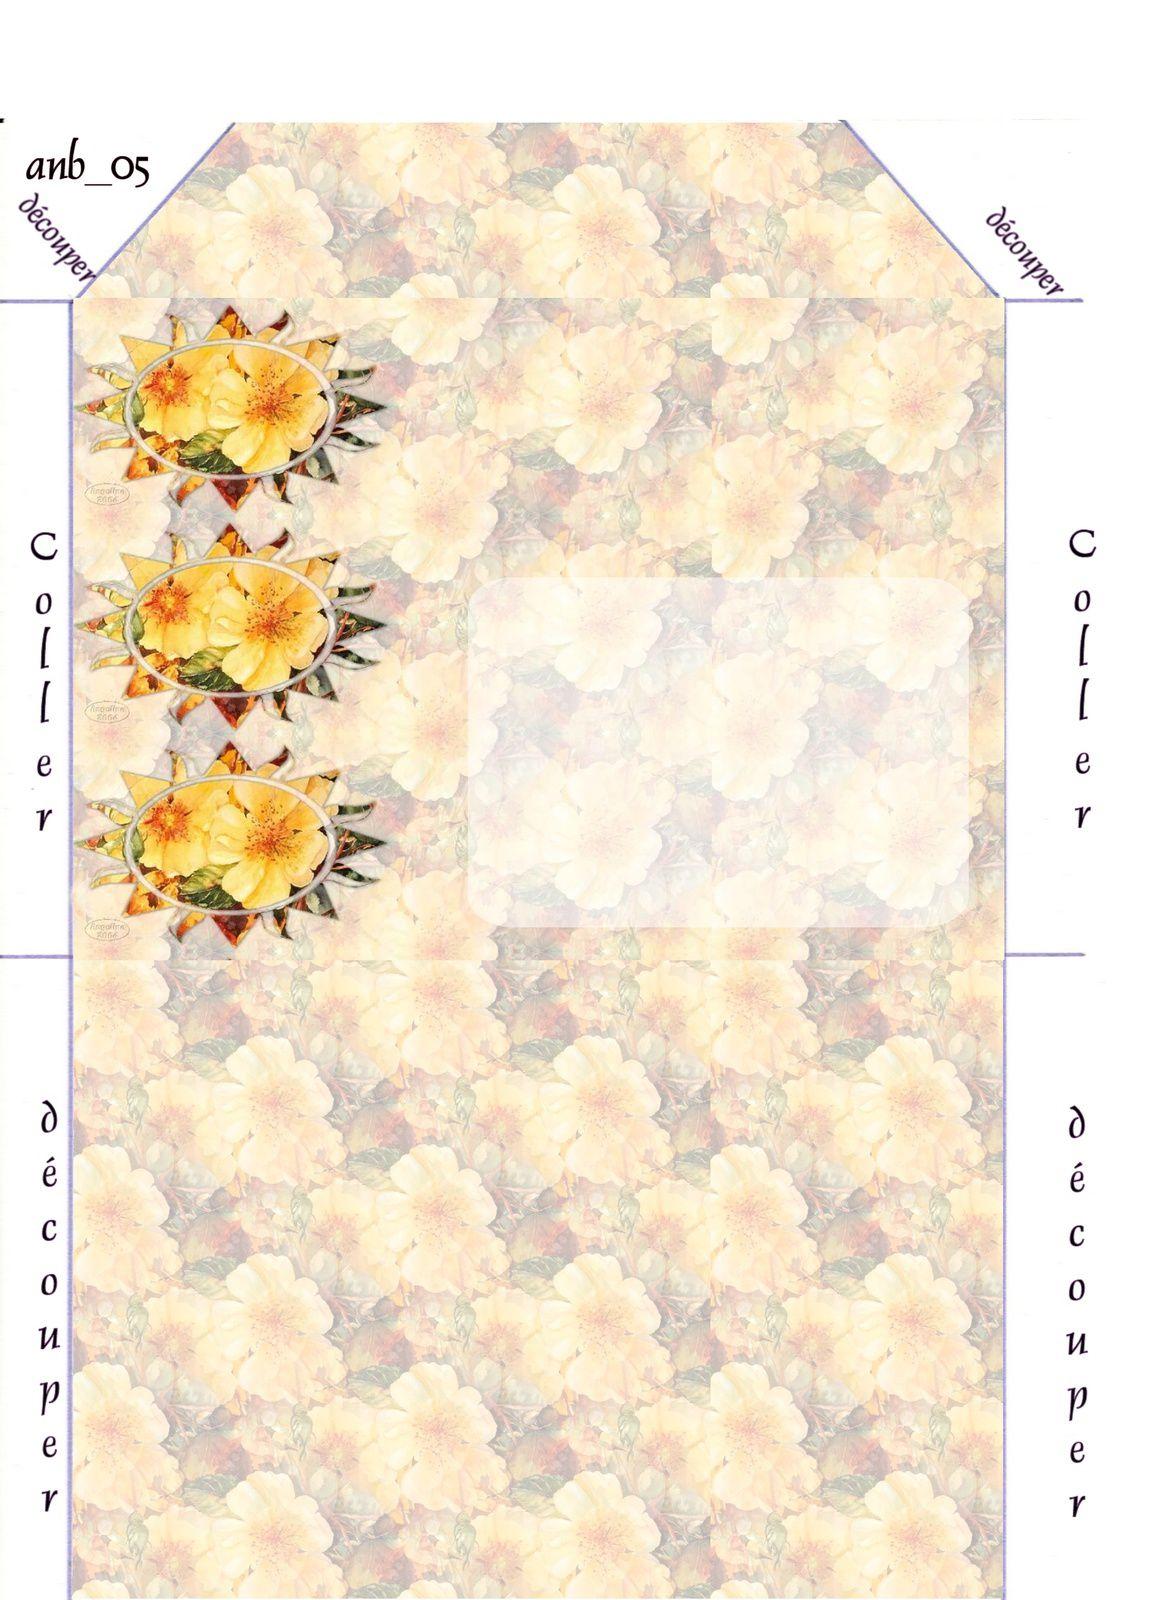 Fleurs Incredimail &amp&#x3B; Papier A4 h l &amp&#x3B; outlook &amp&#x3B; enveloppe &amp&#x3B; 2 cartes A5 &amp&#x3B; signets 3 langues    img57